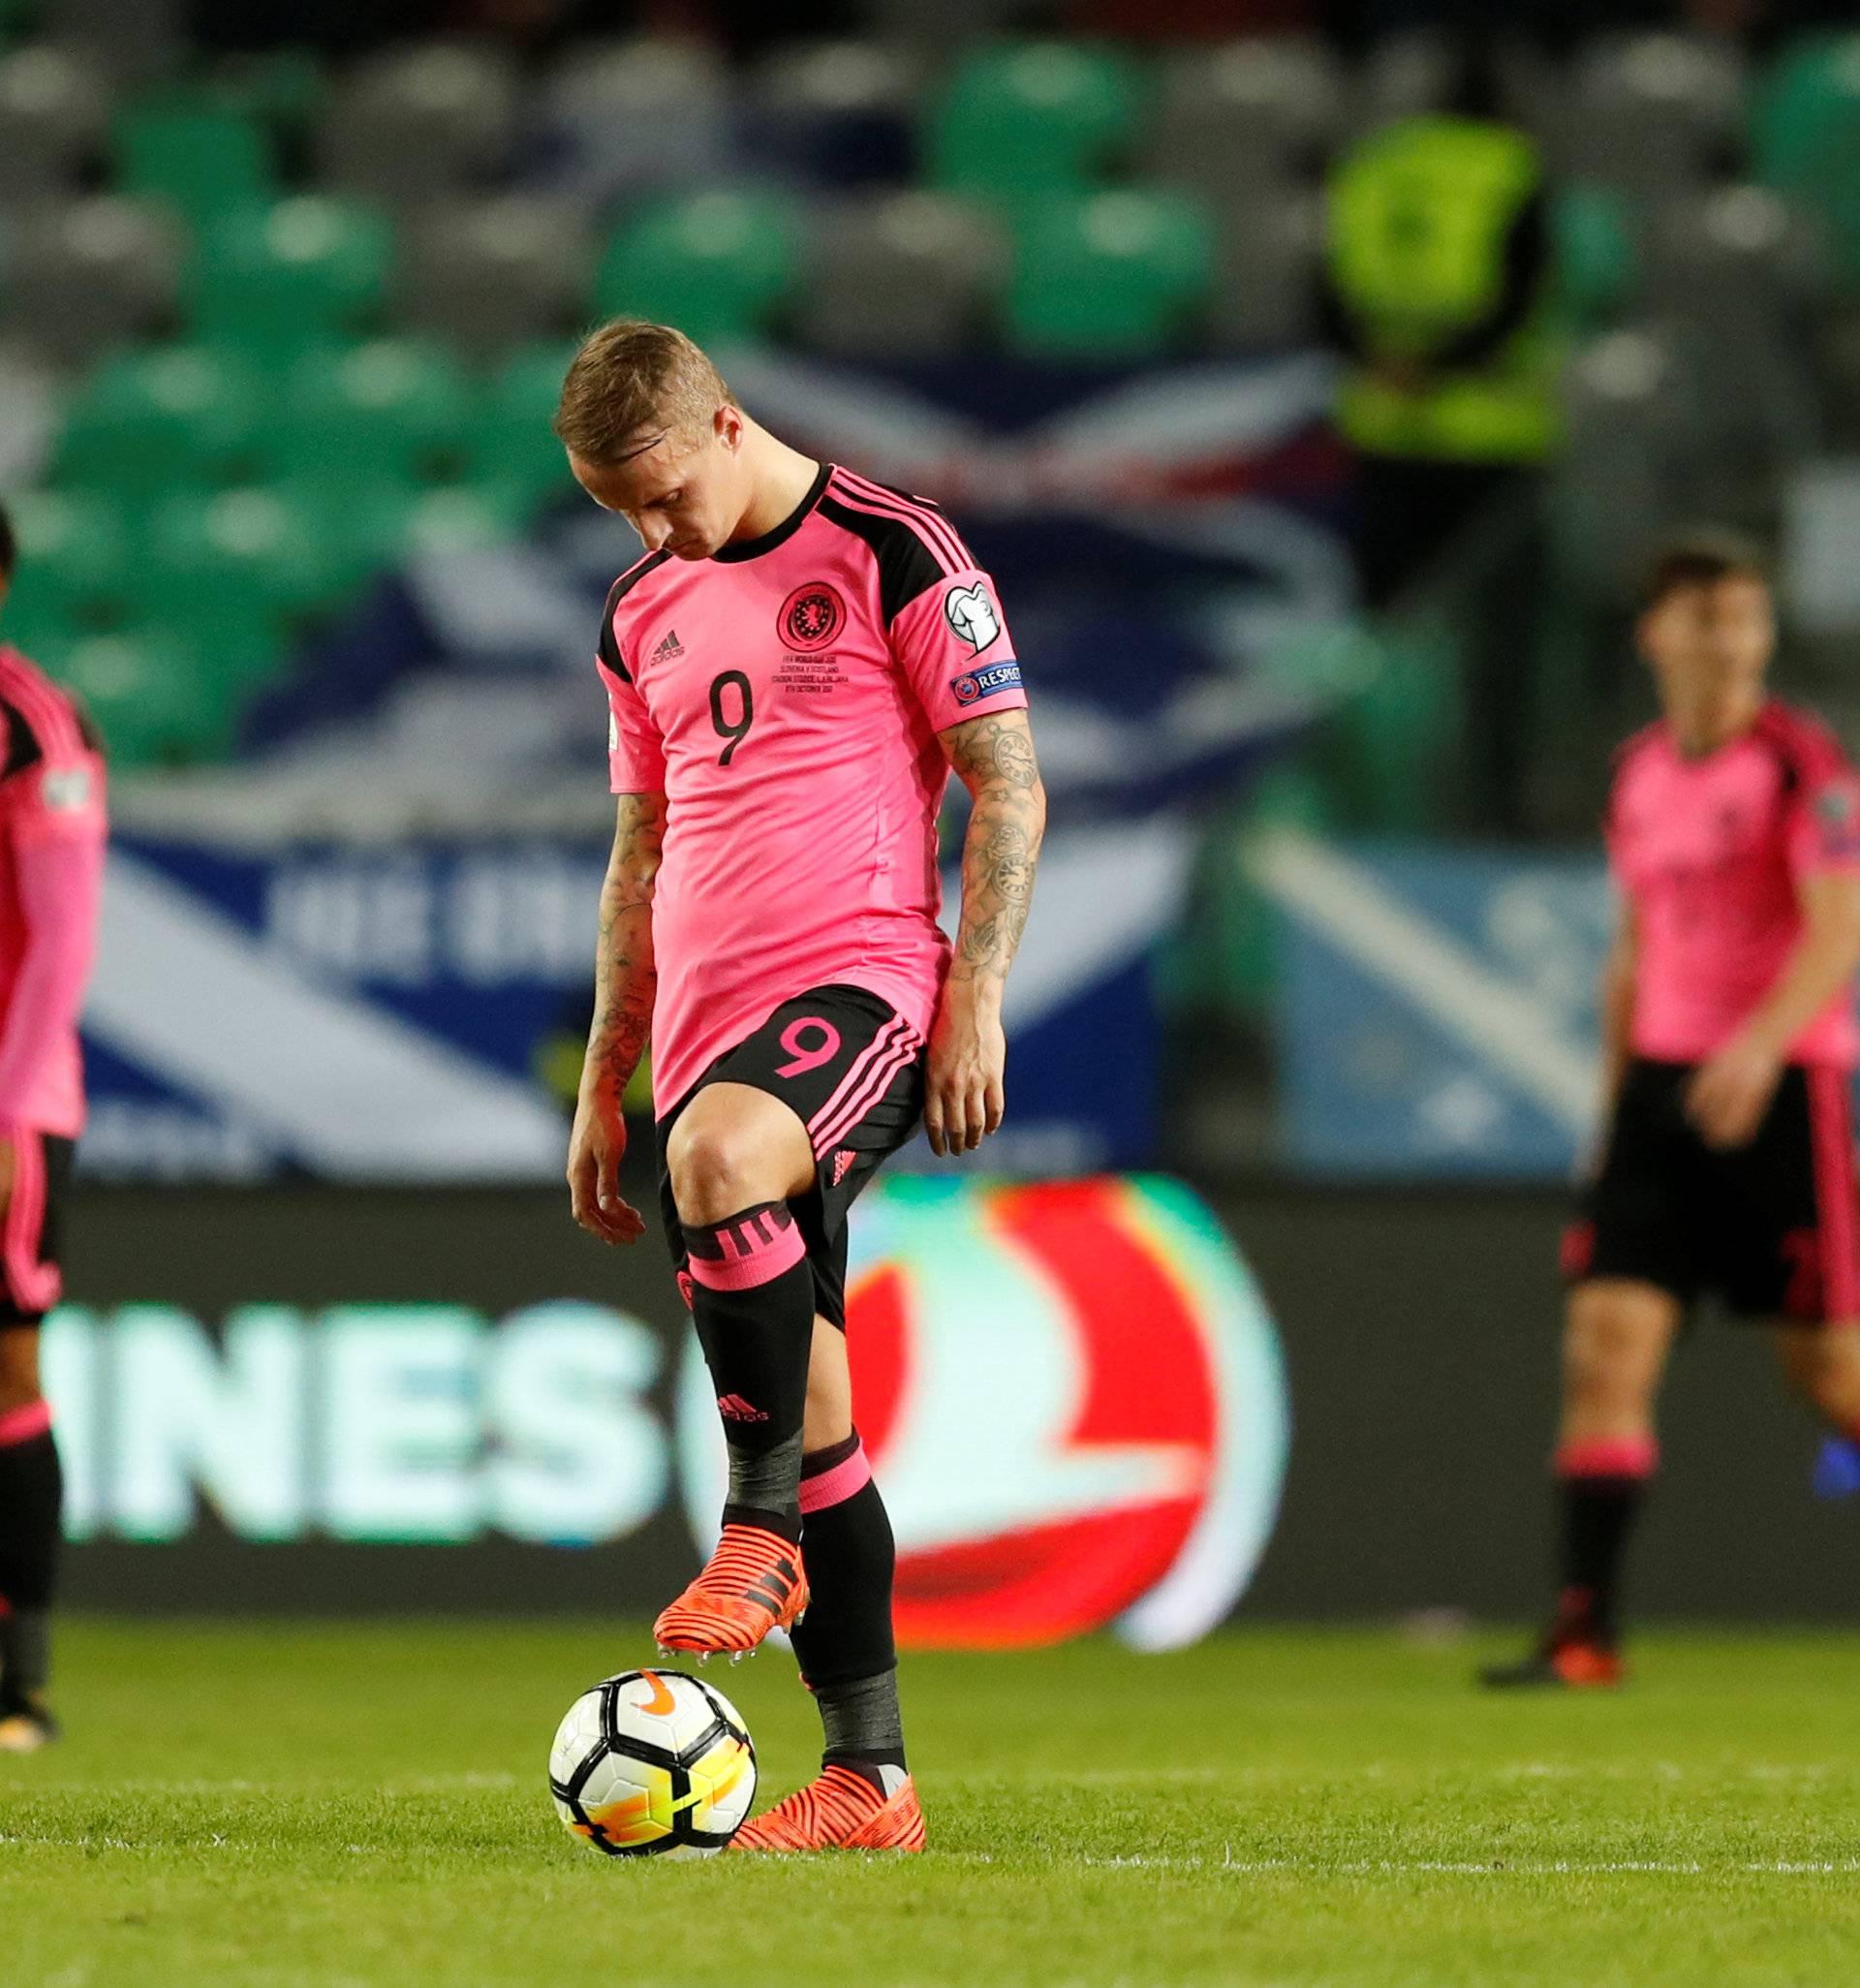 2018 World Cup Qualifications - Europe - Slovenia vs Scotland